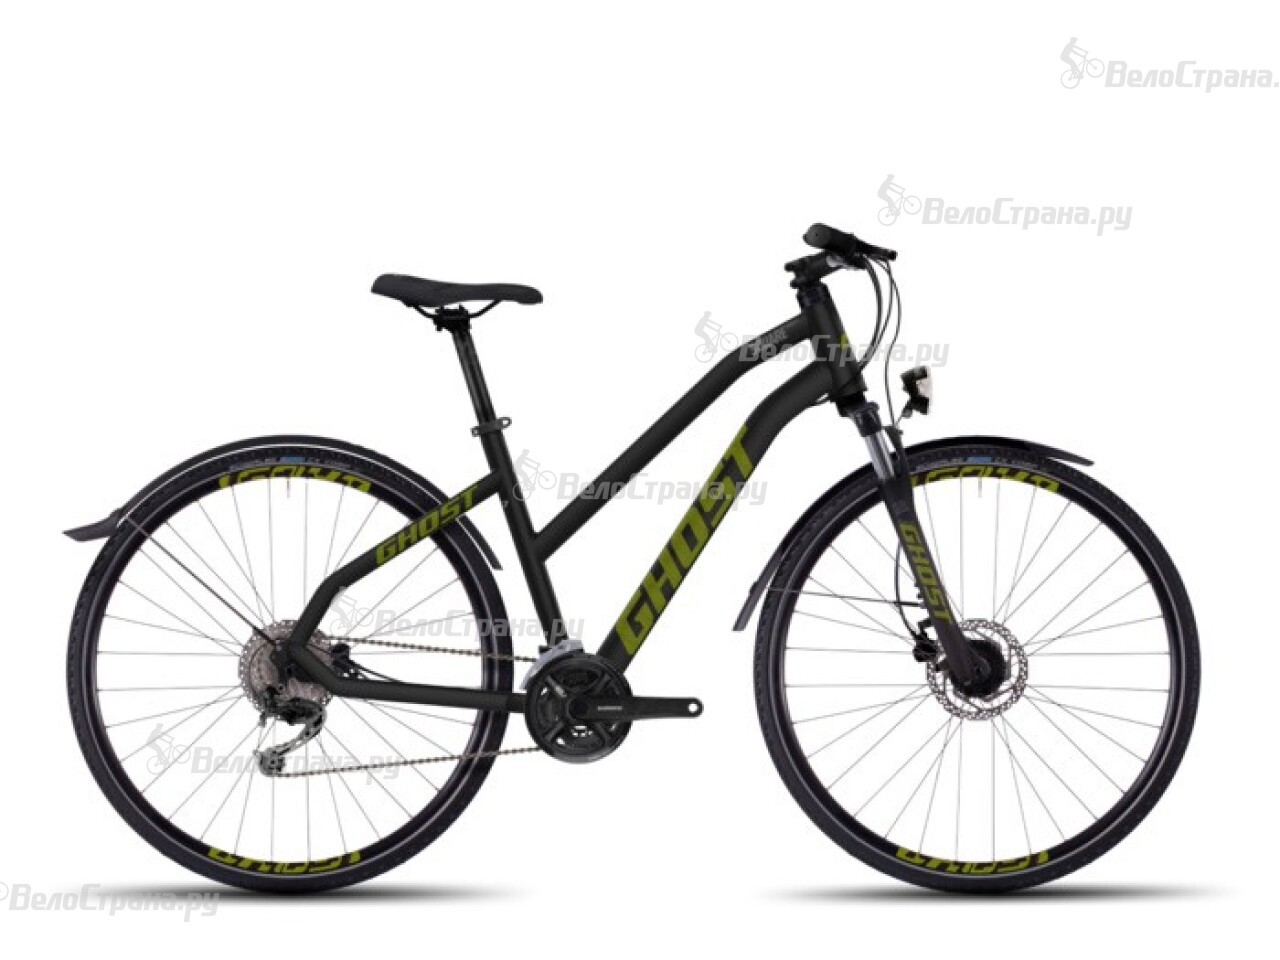 Велосипед Ghost SQUARE Cross X 4 Miss (2016) цены онлайн